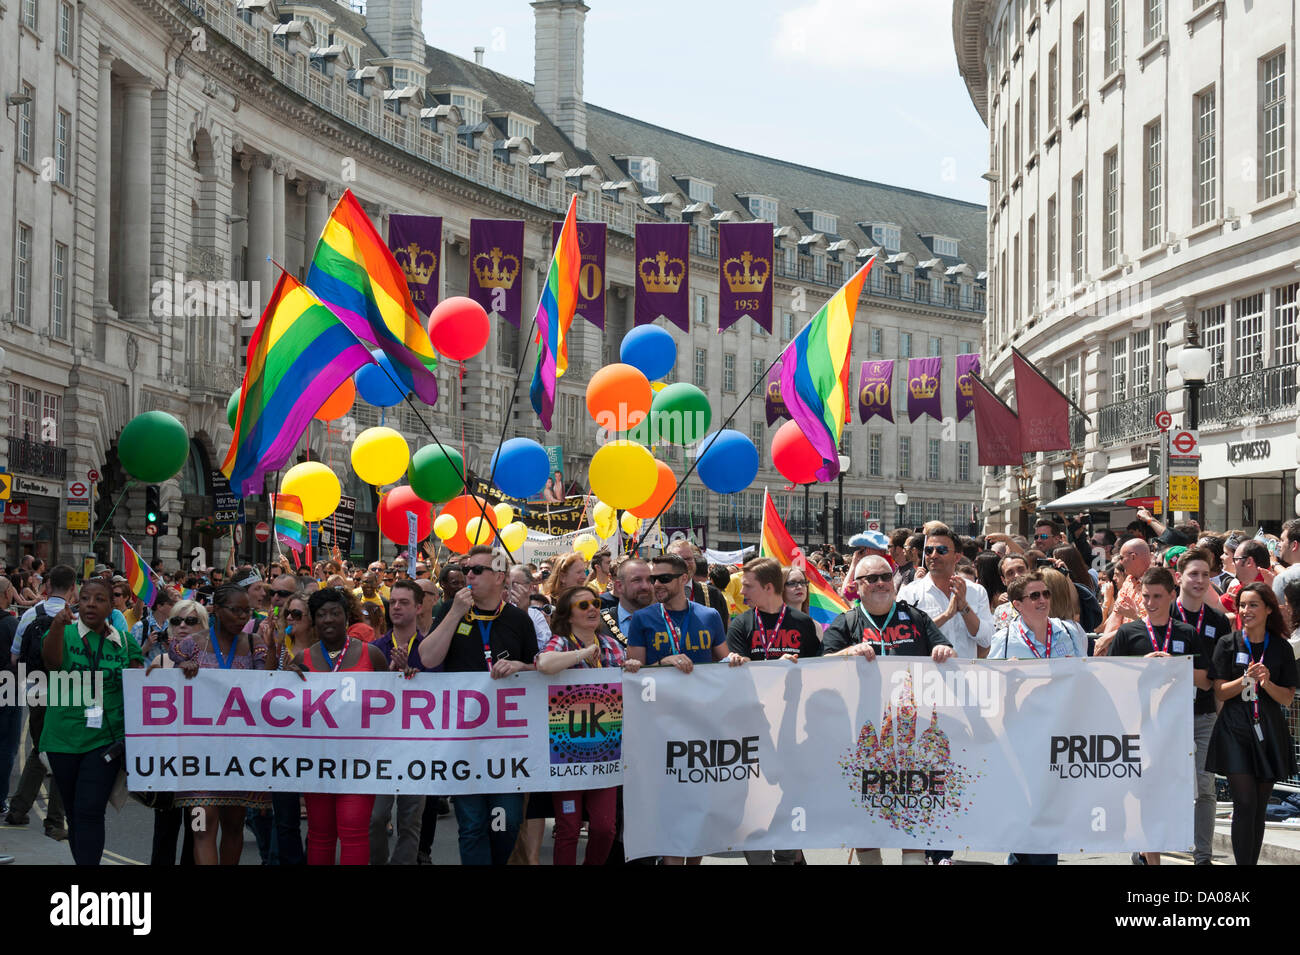 London, UK. 29th June 2013.  The London Pride parade on Regent's Street in London. Photographer: Gordon Scammell/Alamy - Stock Image